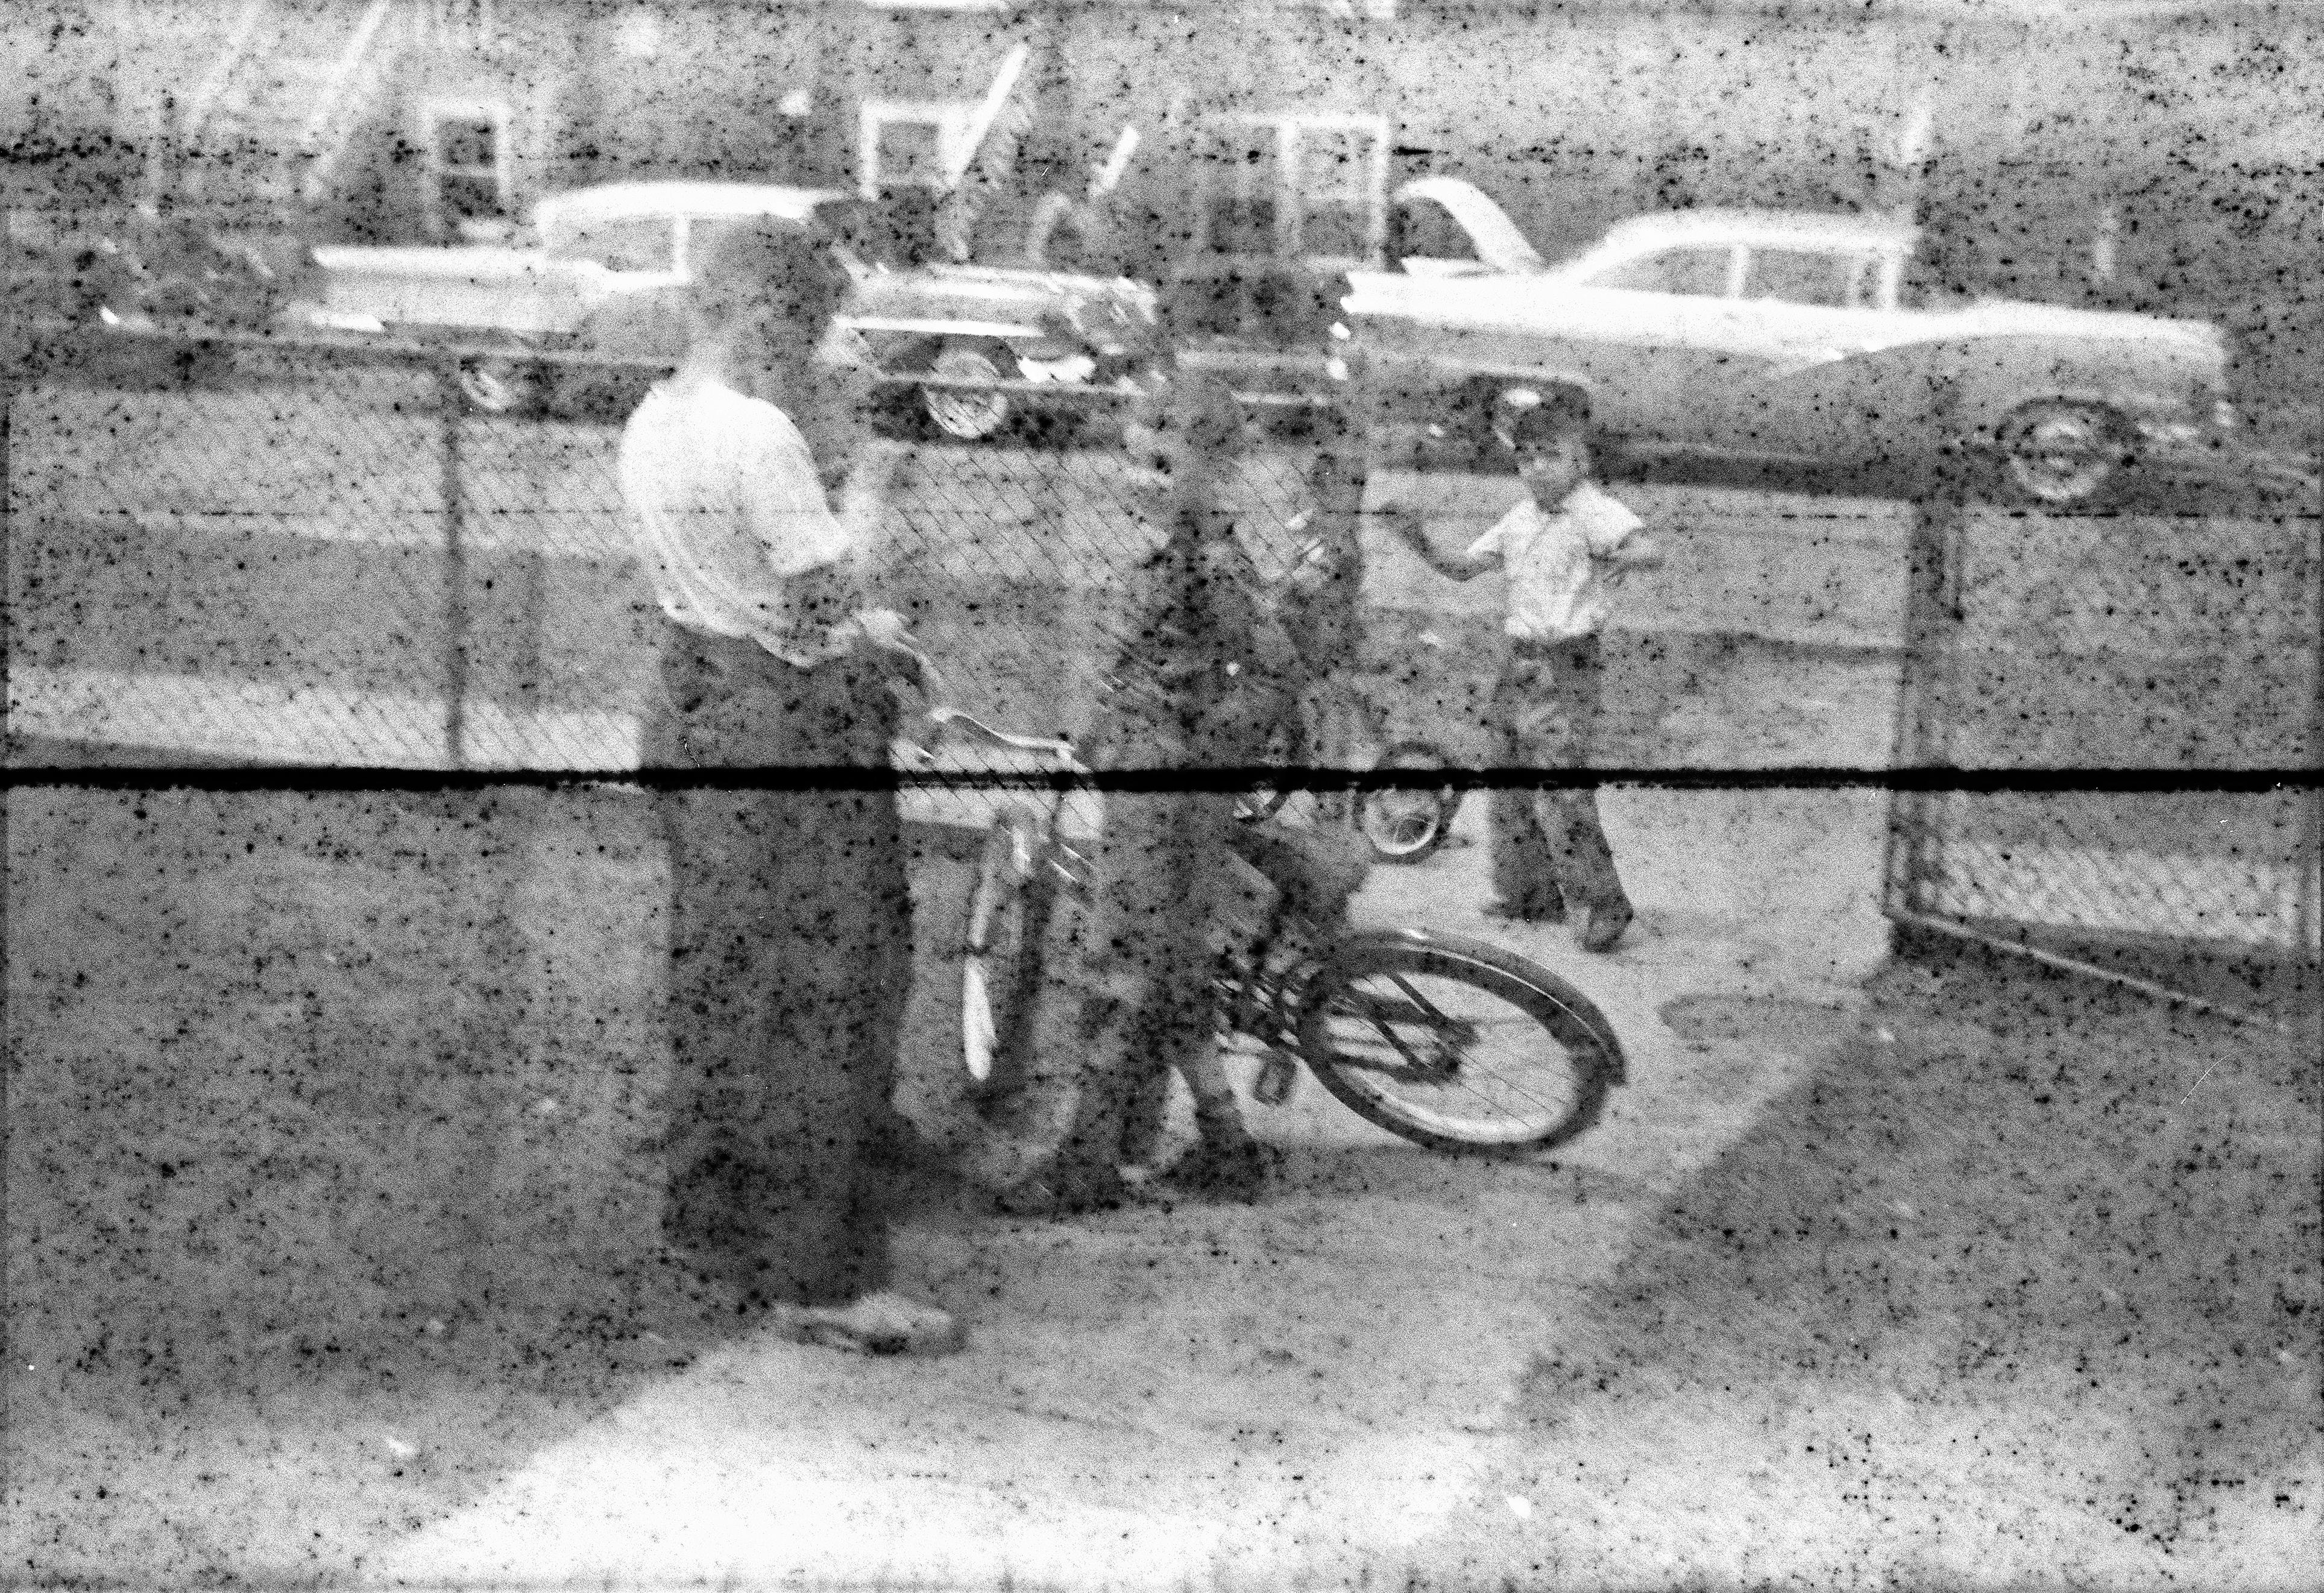 Paul Bundle 60 Roll 1 007.jpg